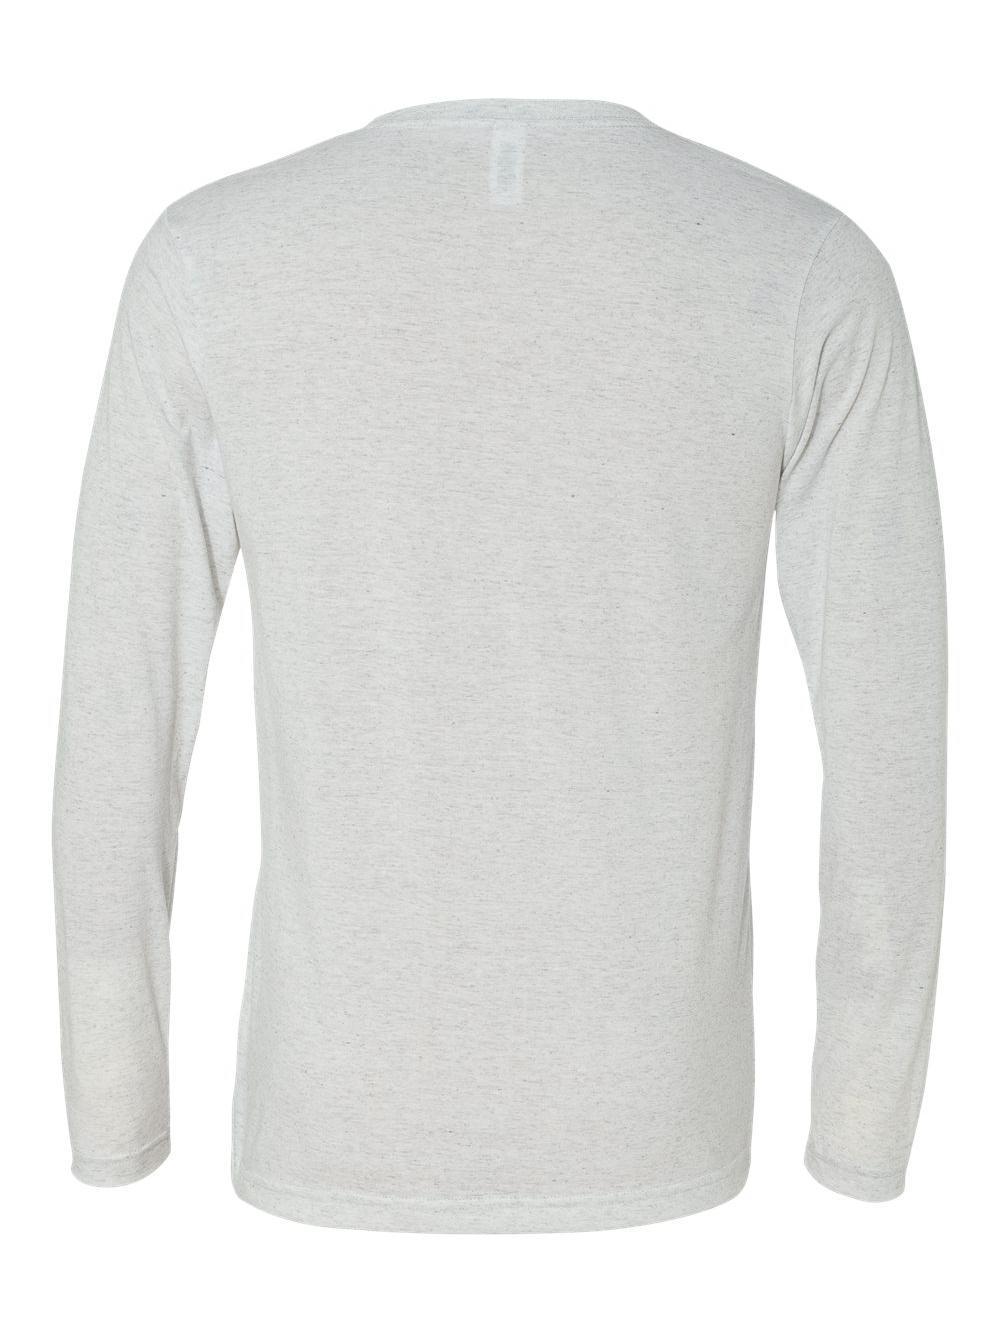 c9d1b94f4d2 Bella + Canvas - Unisex Long Sleeve V-Neck Tee - 3425 | eBay